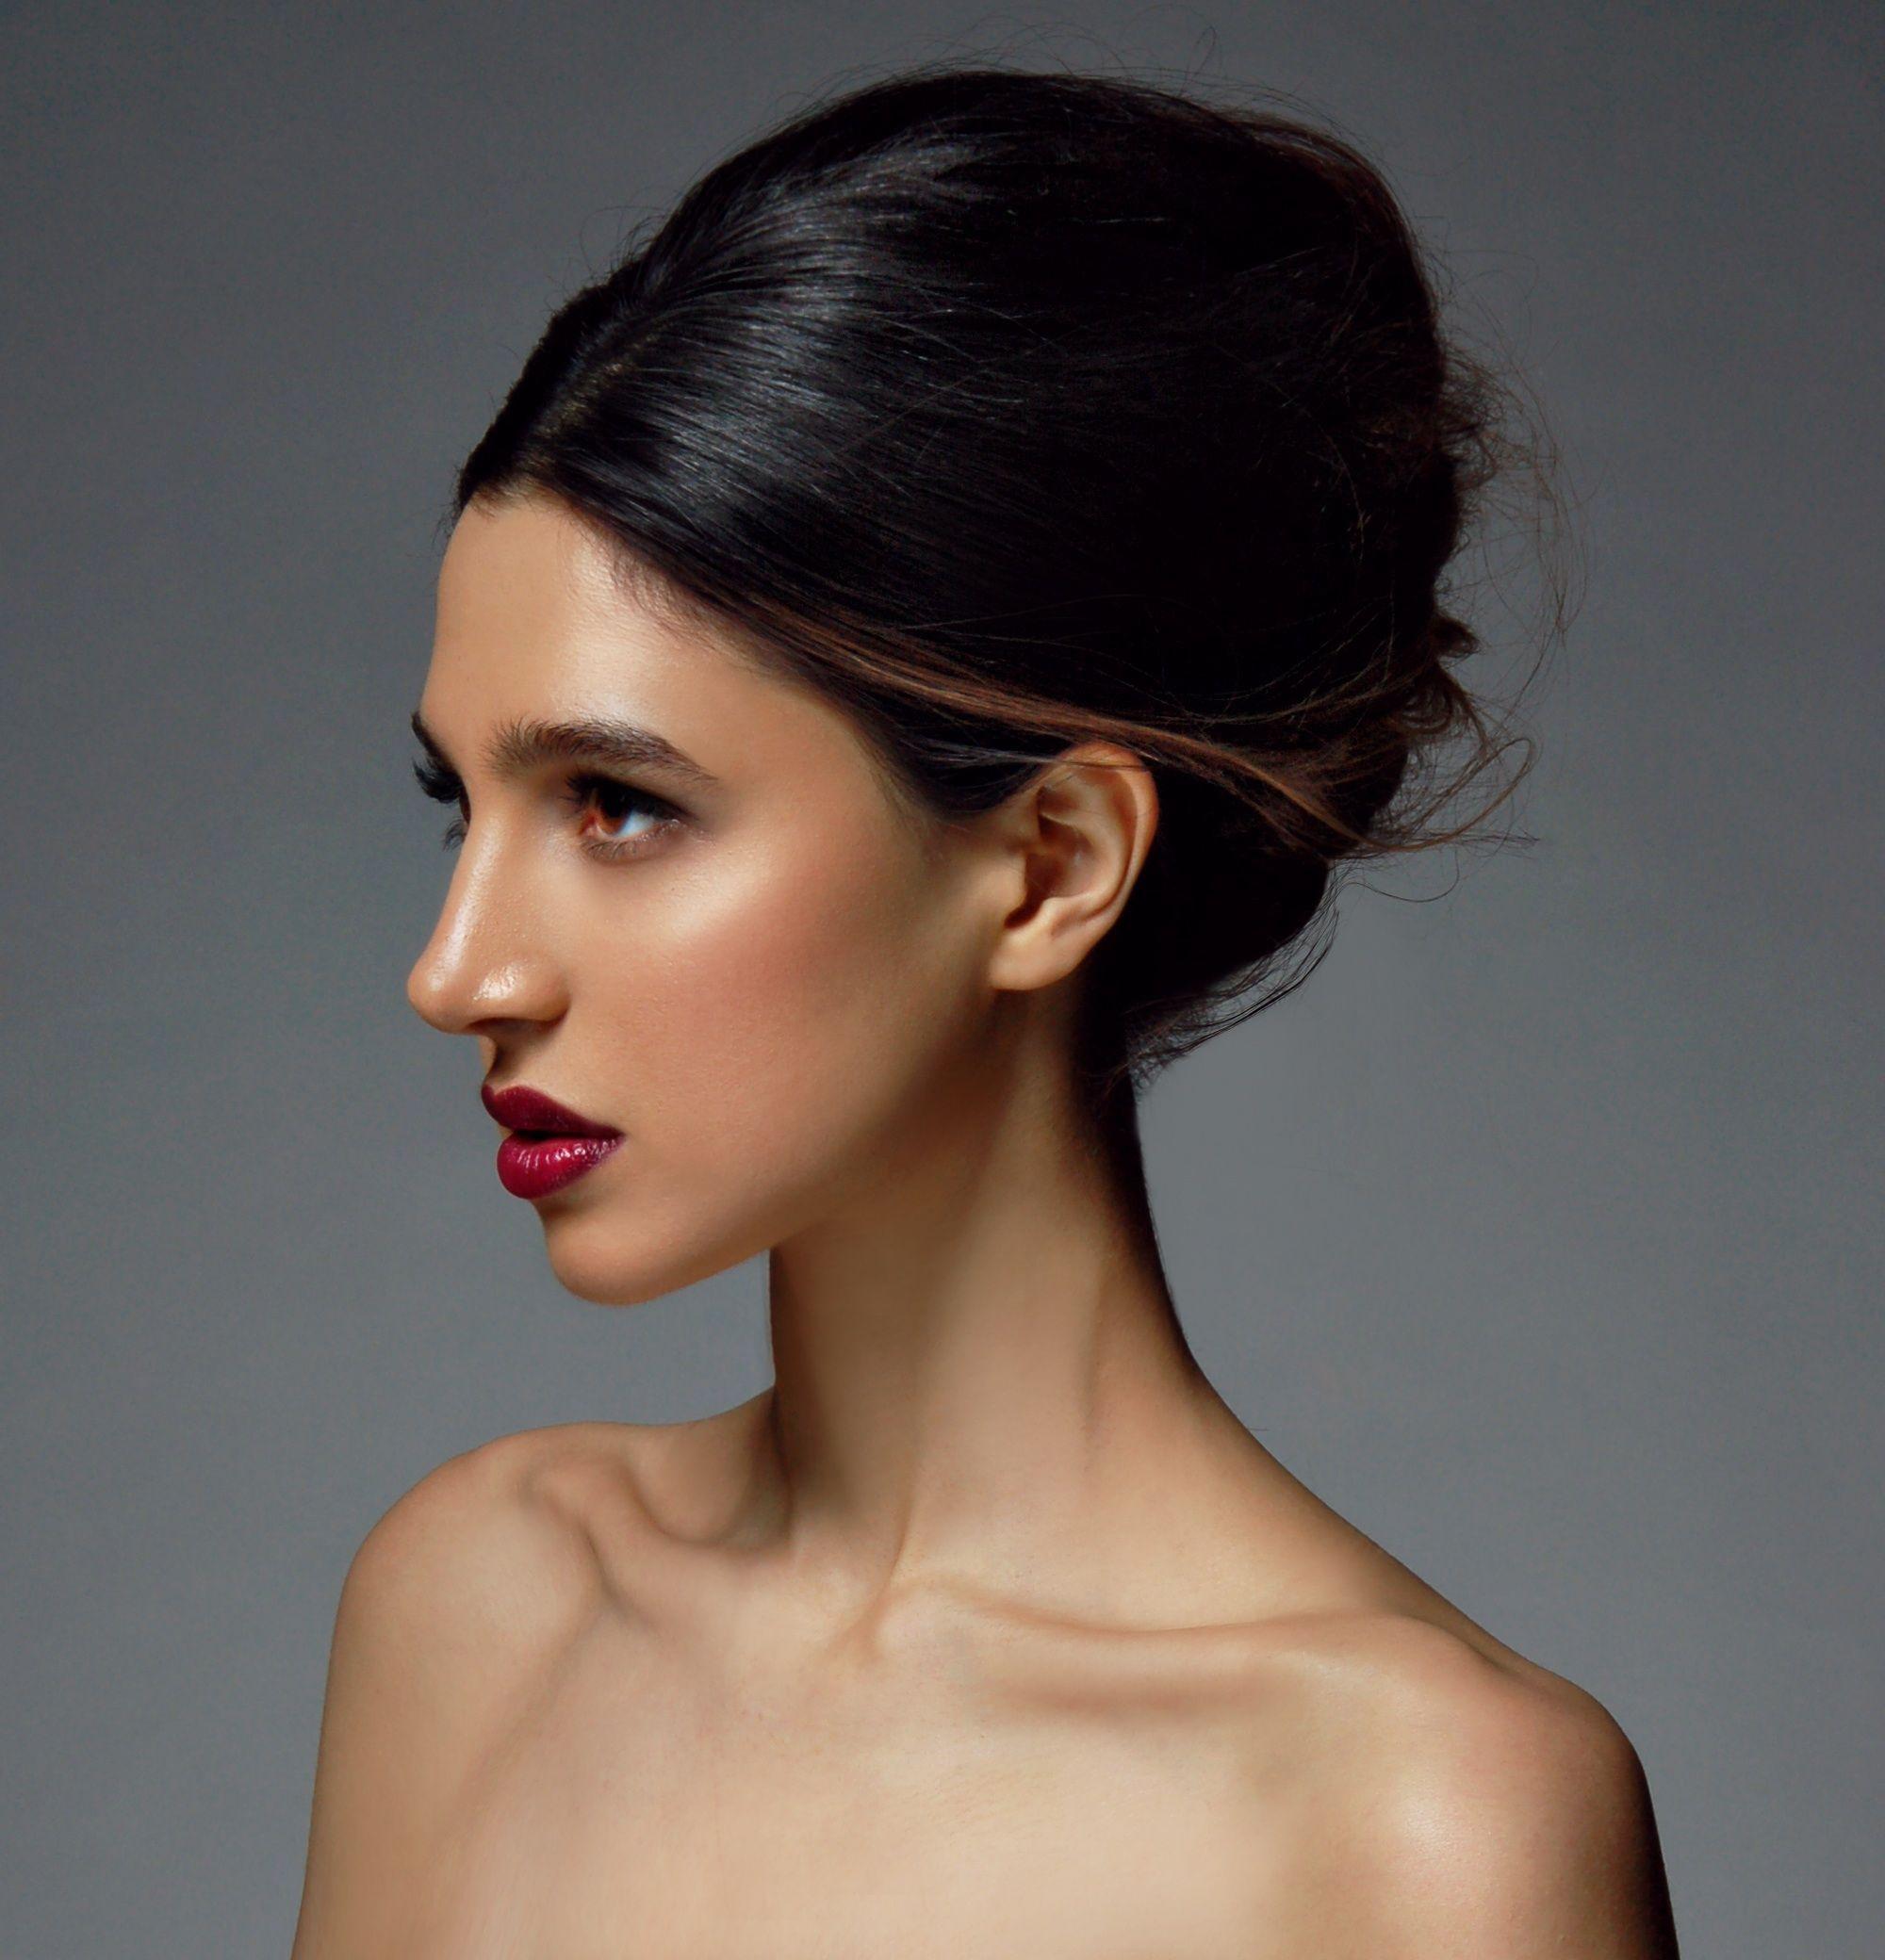 Southeast Asian Beauty. Hair By Connie Tsang